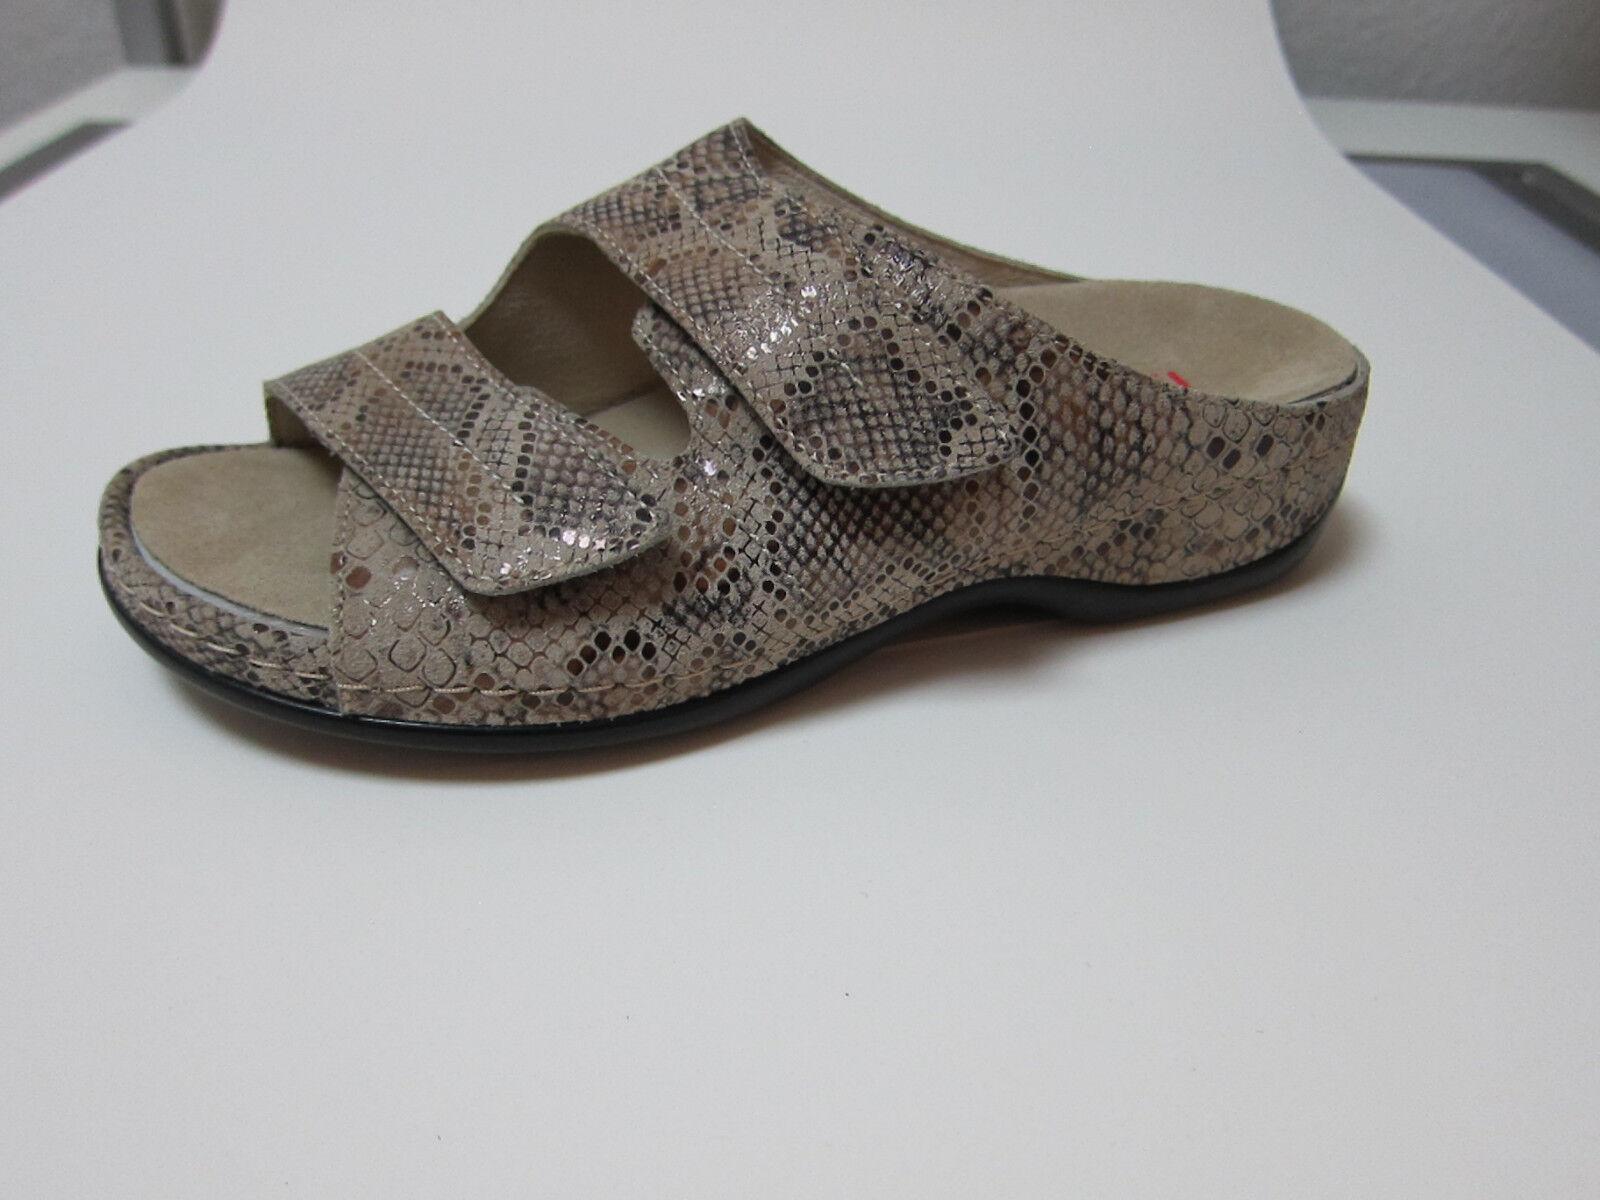 BERKEMANN Daria Damen Loses Fußbett Gr. 37,5 (4,5)  1628   | Sehr gute Farbe